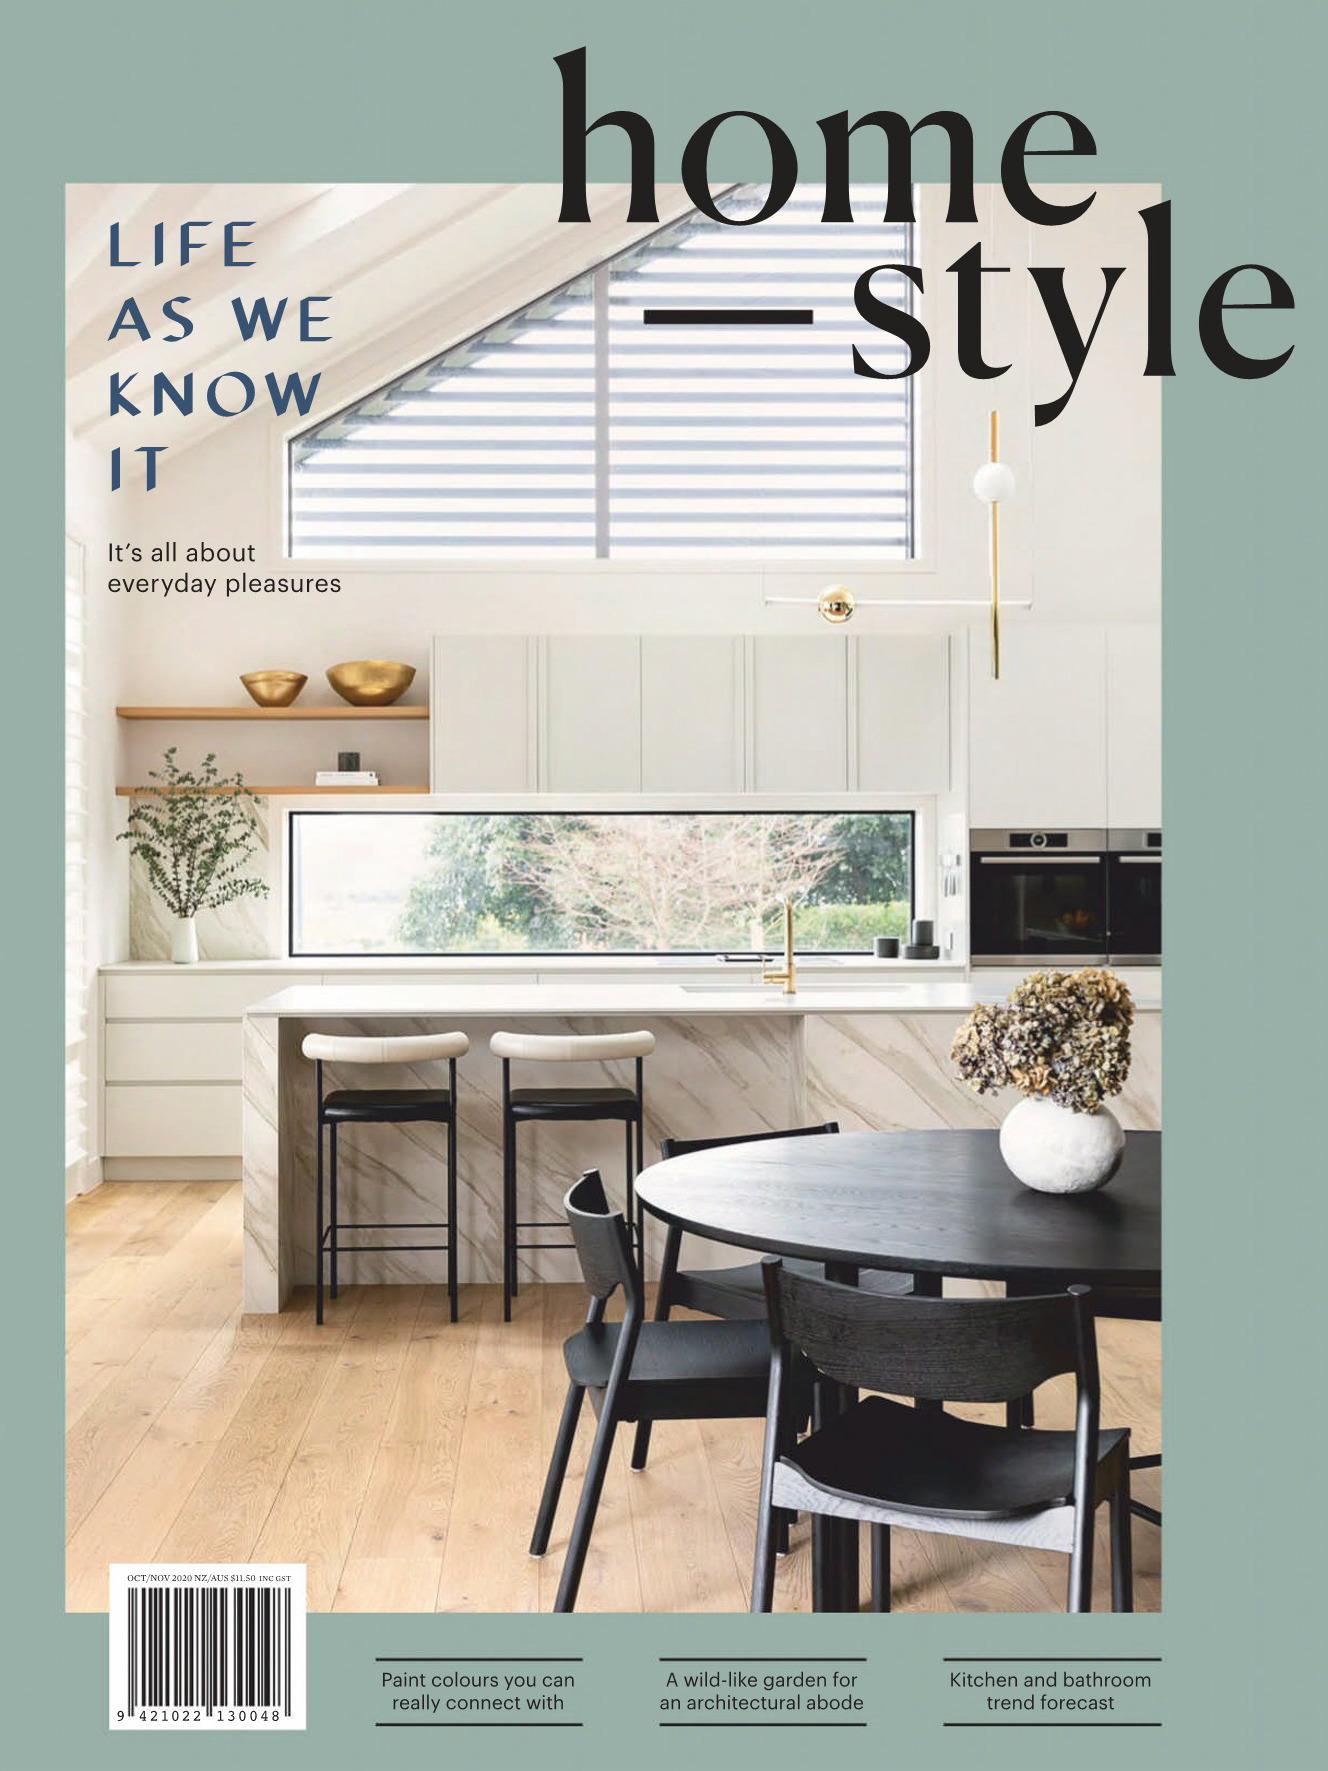 《Homestyle》新西兰室内装饰设计杂志2020年10-11月号